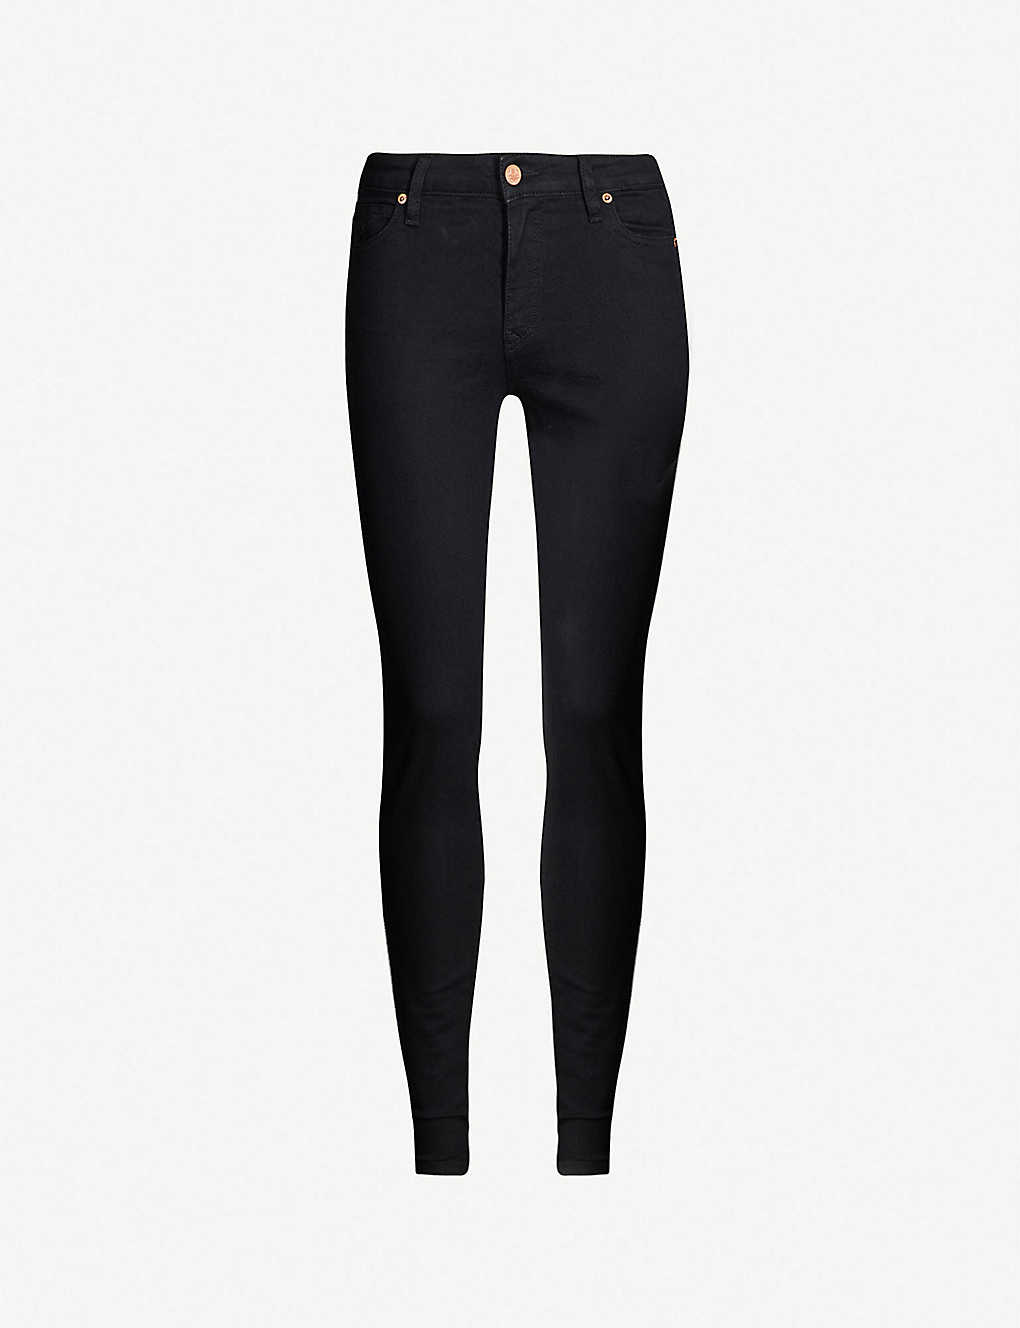 VIVIENNE WESTWOOD ANGLOMANIA - Slim-fit mid-rise jeans  3d594ed17